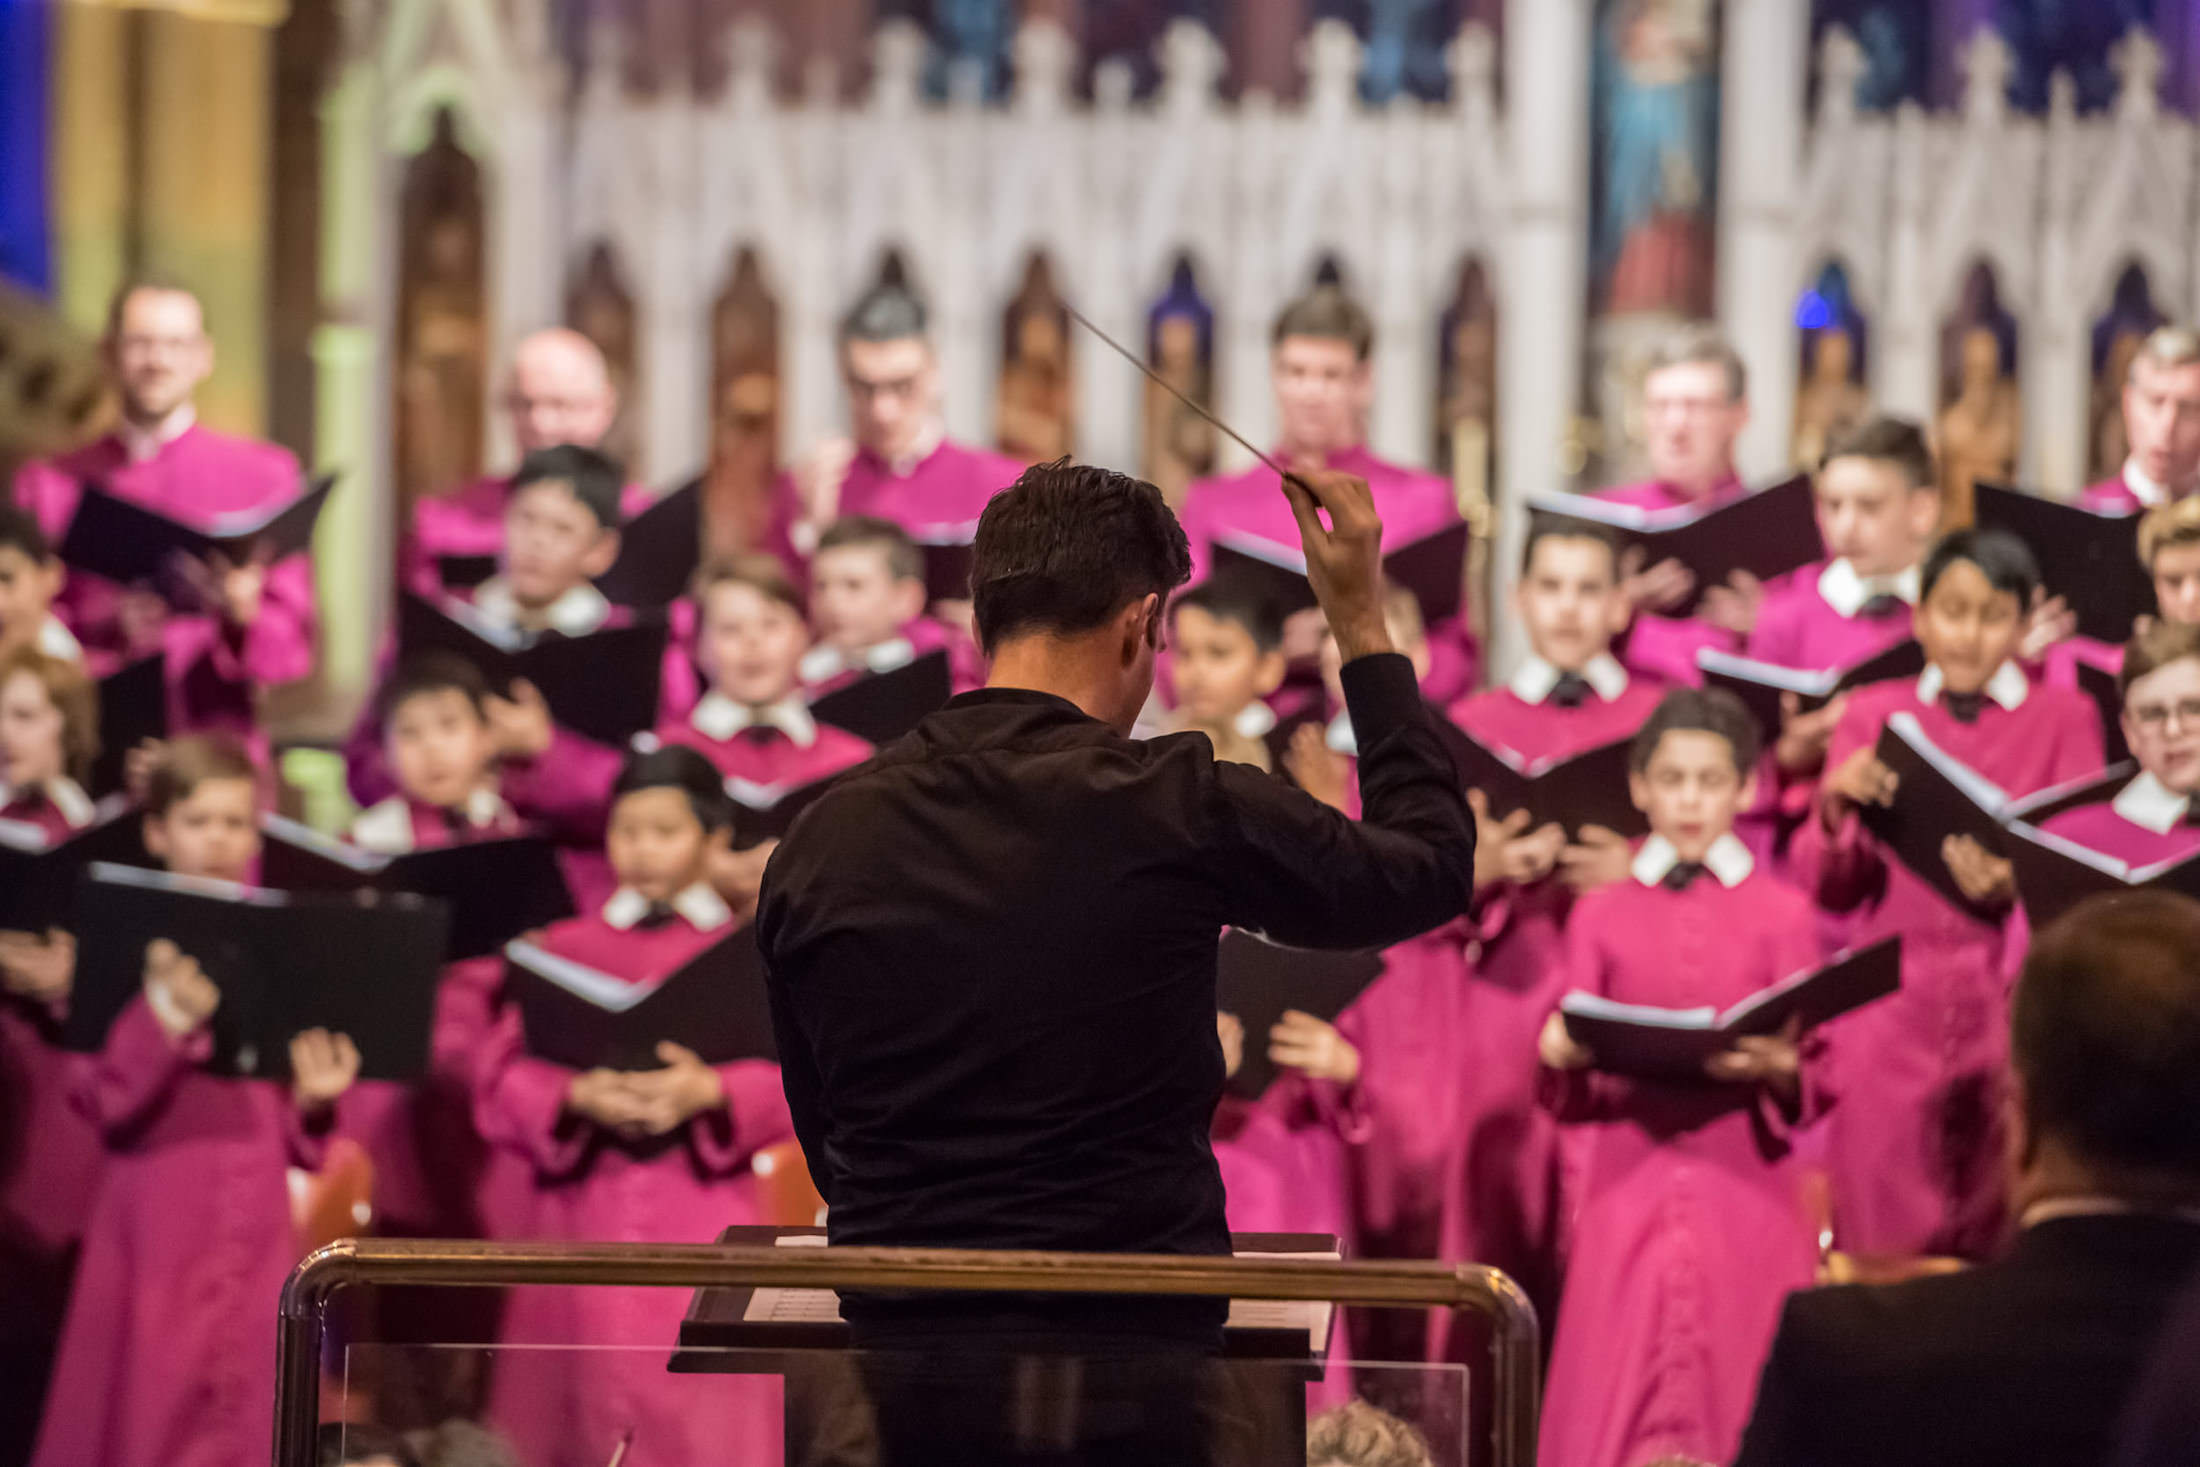 A Choral Christmas Celebration - Rediscover the joy of Christmas through musicFriday 14th December 2018, 11 a.m. & 7 p.m.